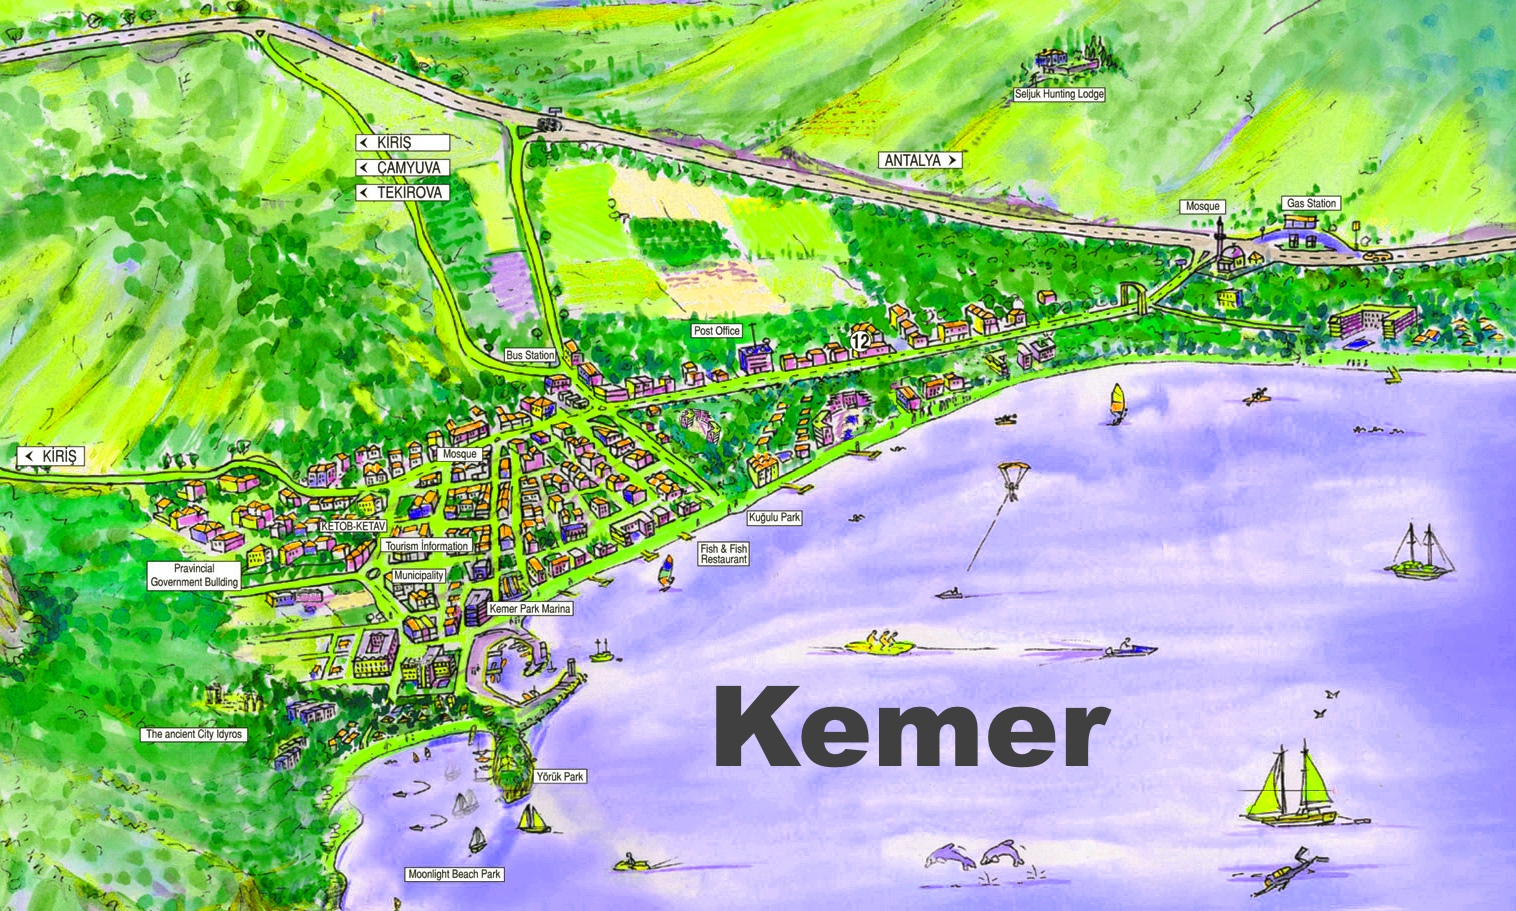 Kemer tourist map